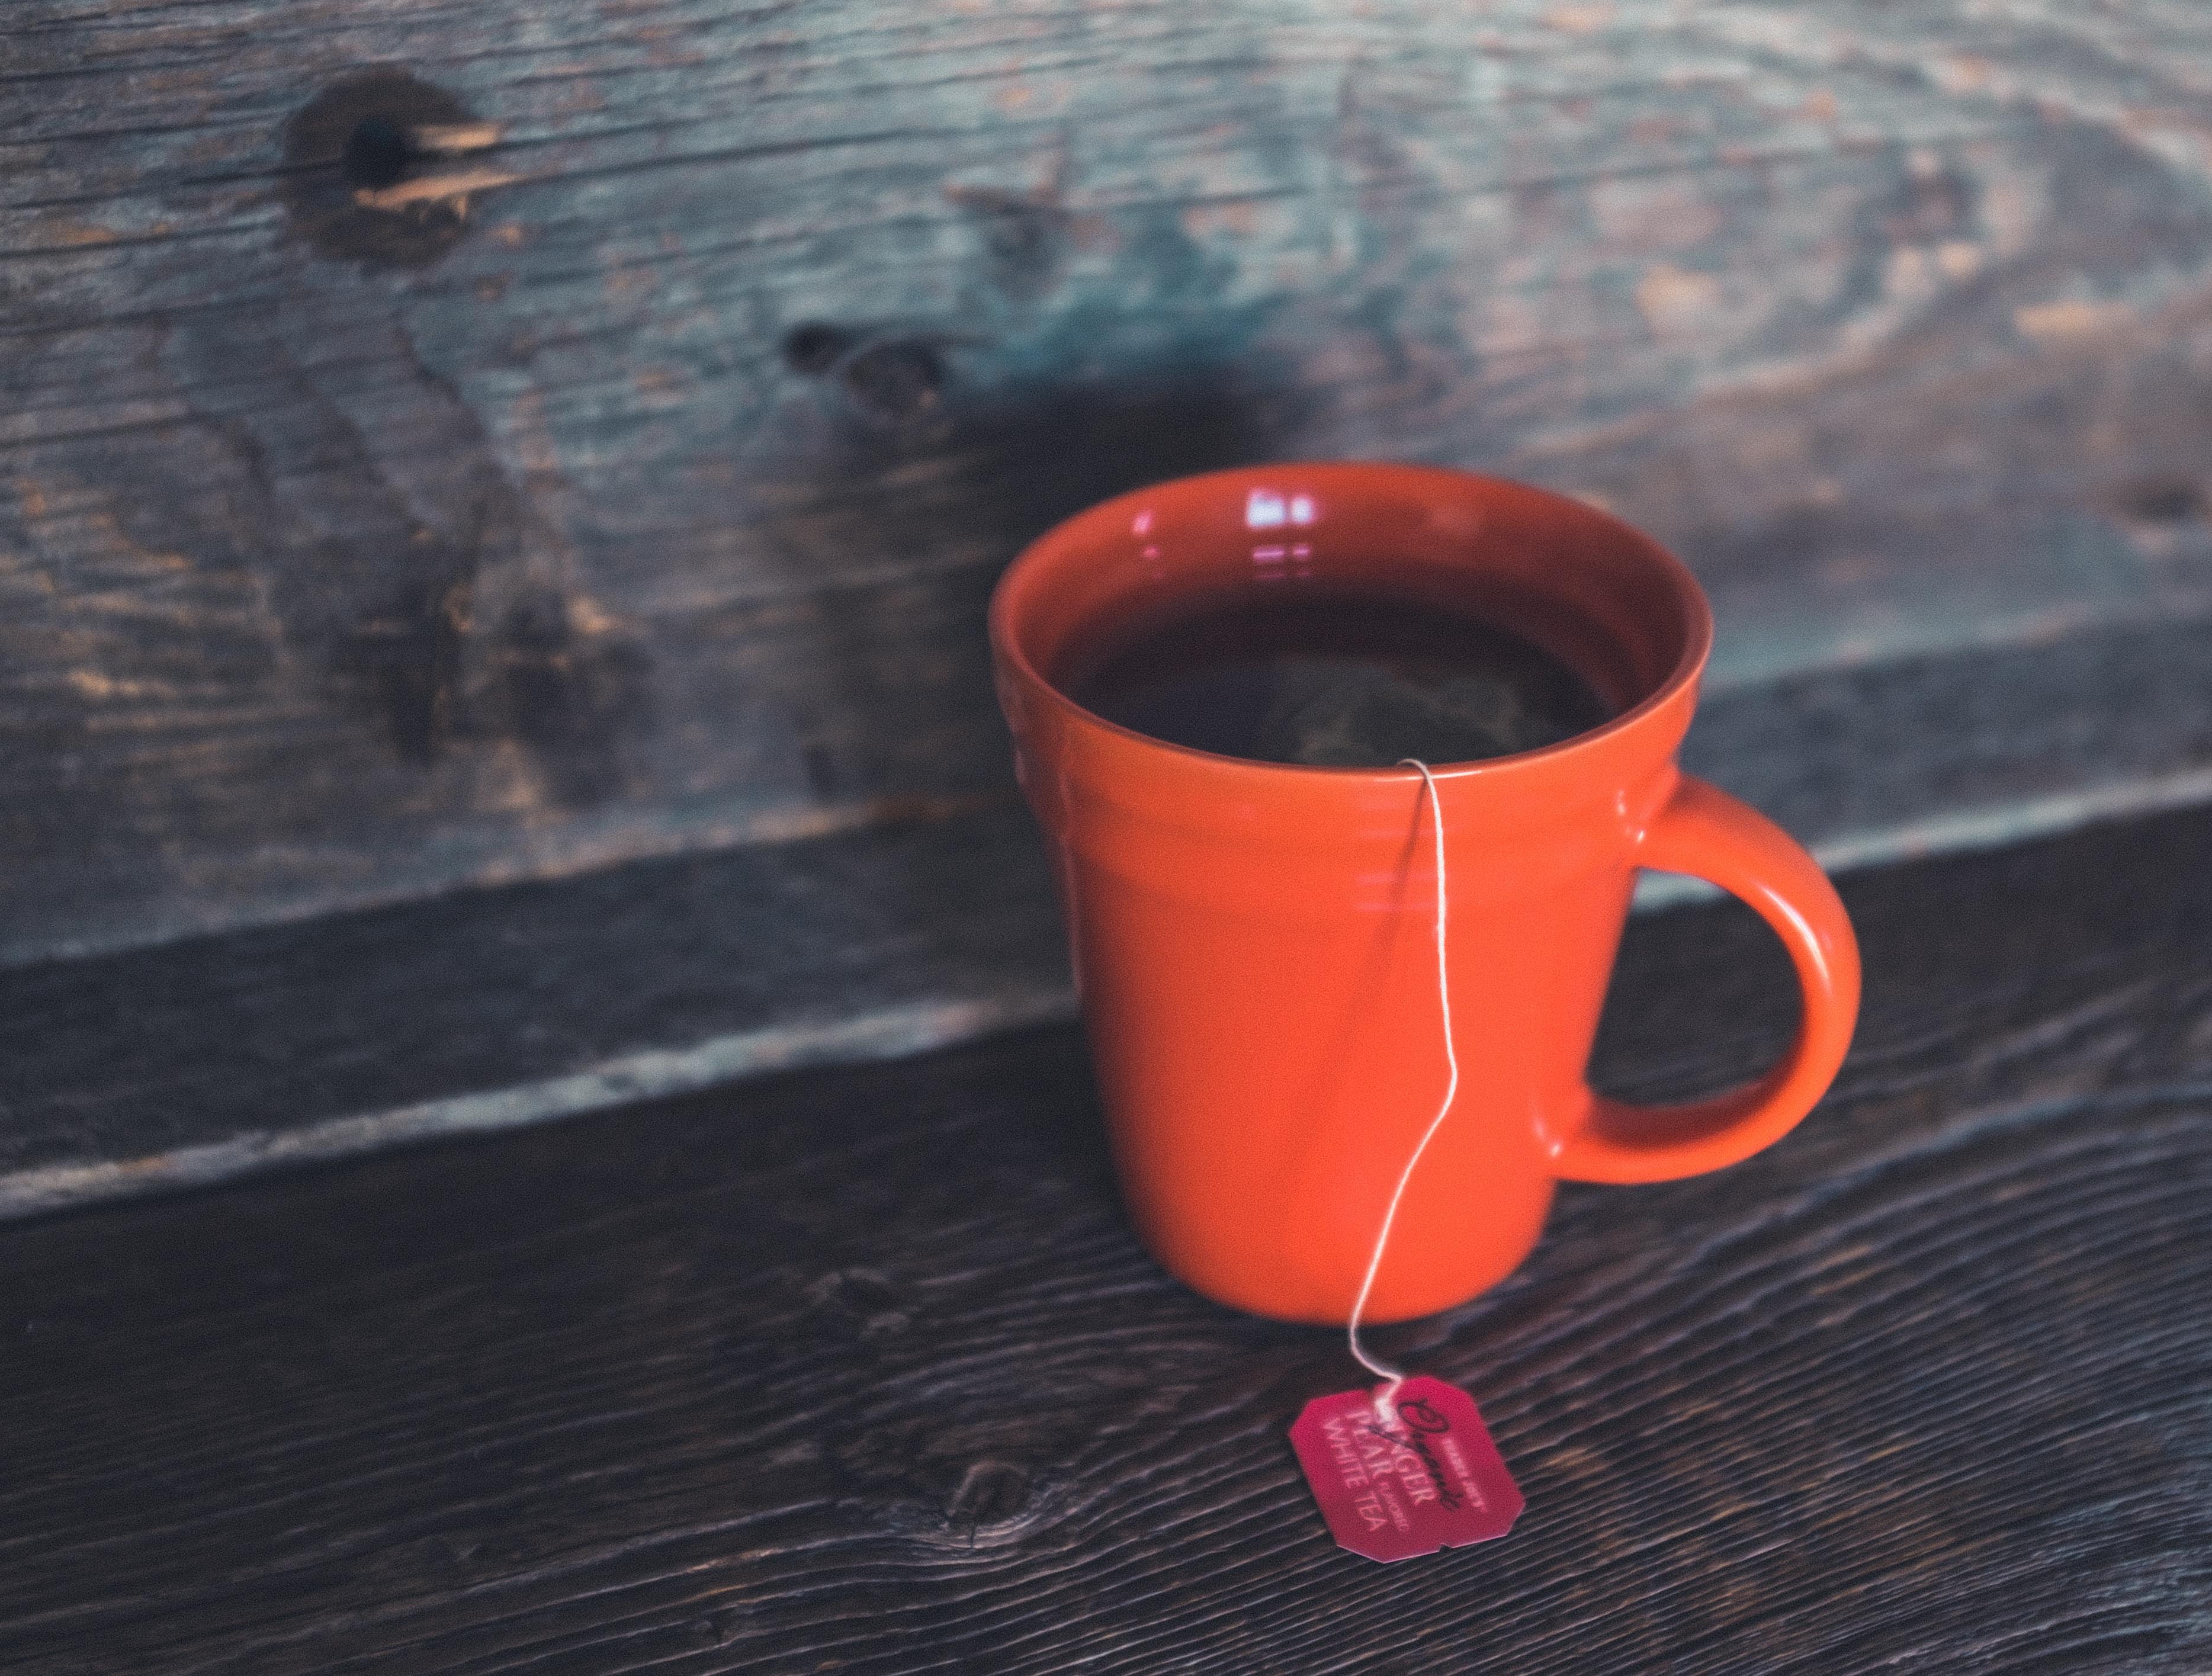 orange ceramic teacup on gray bord